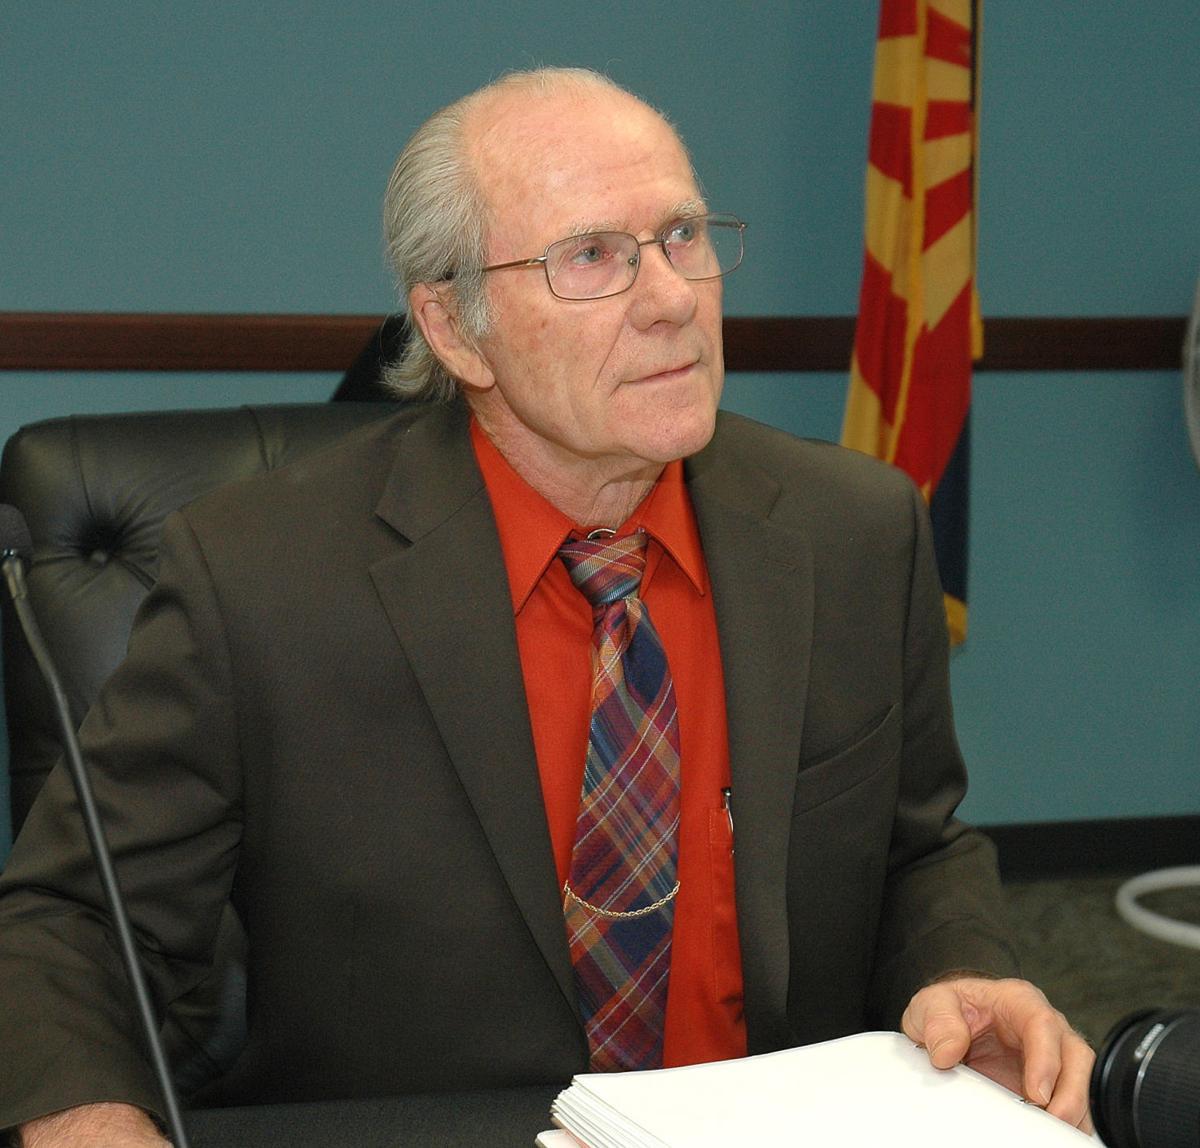 Arizona Utility Regulator Rejects APS's Financial